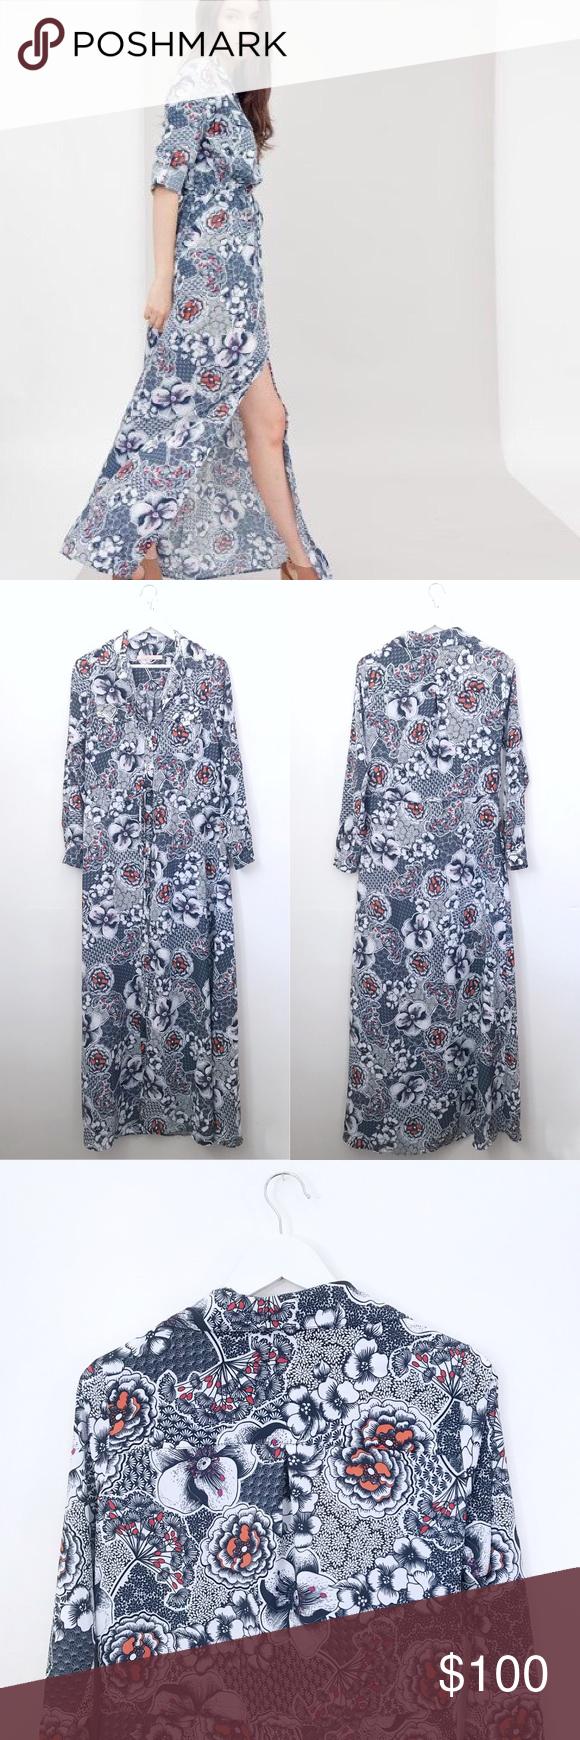 Anthropologie hutch mackenzie floral maxi dress